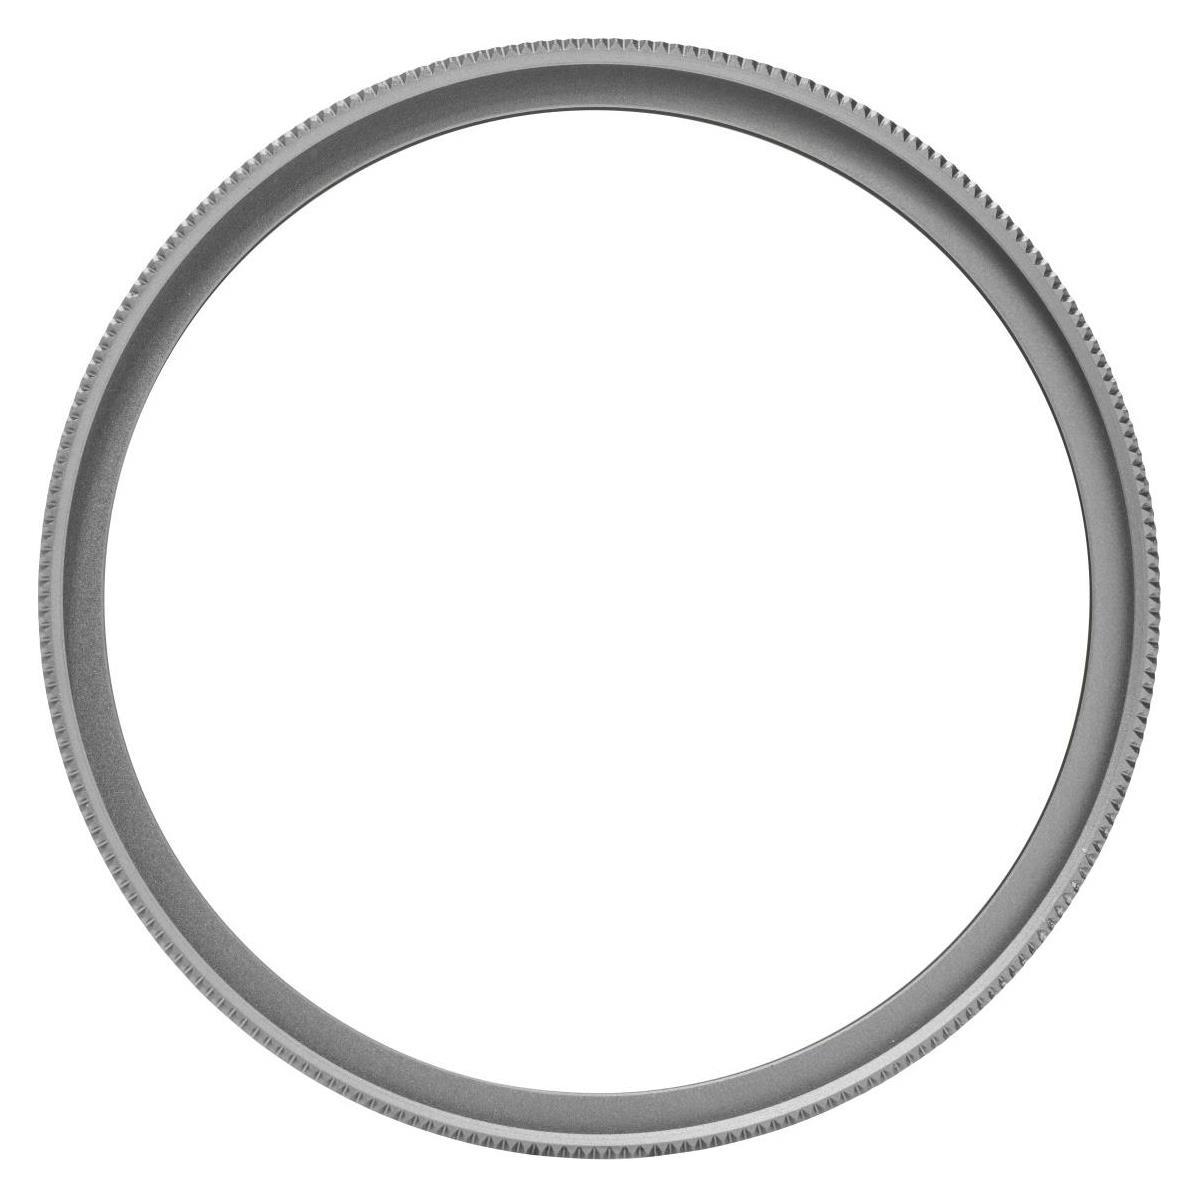 MeFOTO 52mm Lens Karma UV/Lens Protection Filter (titanium) $5 + free s/h